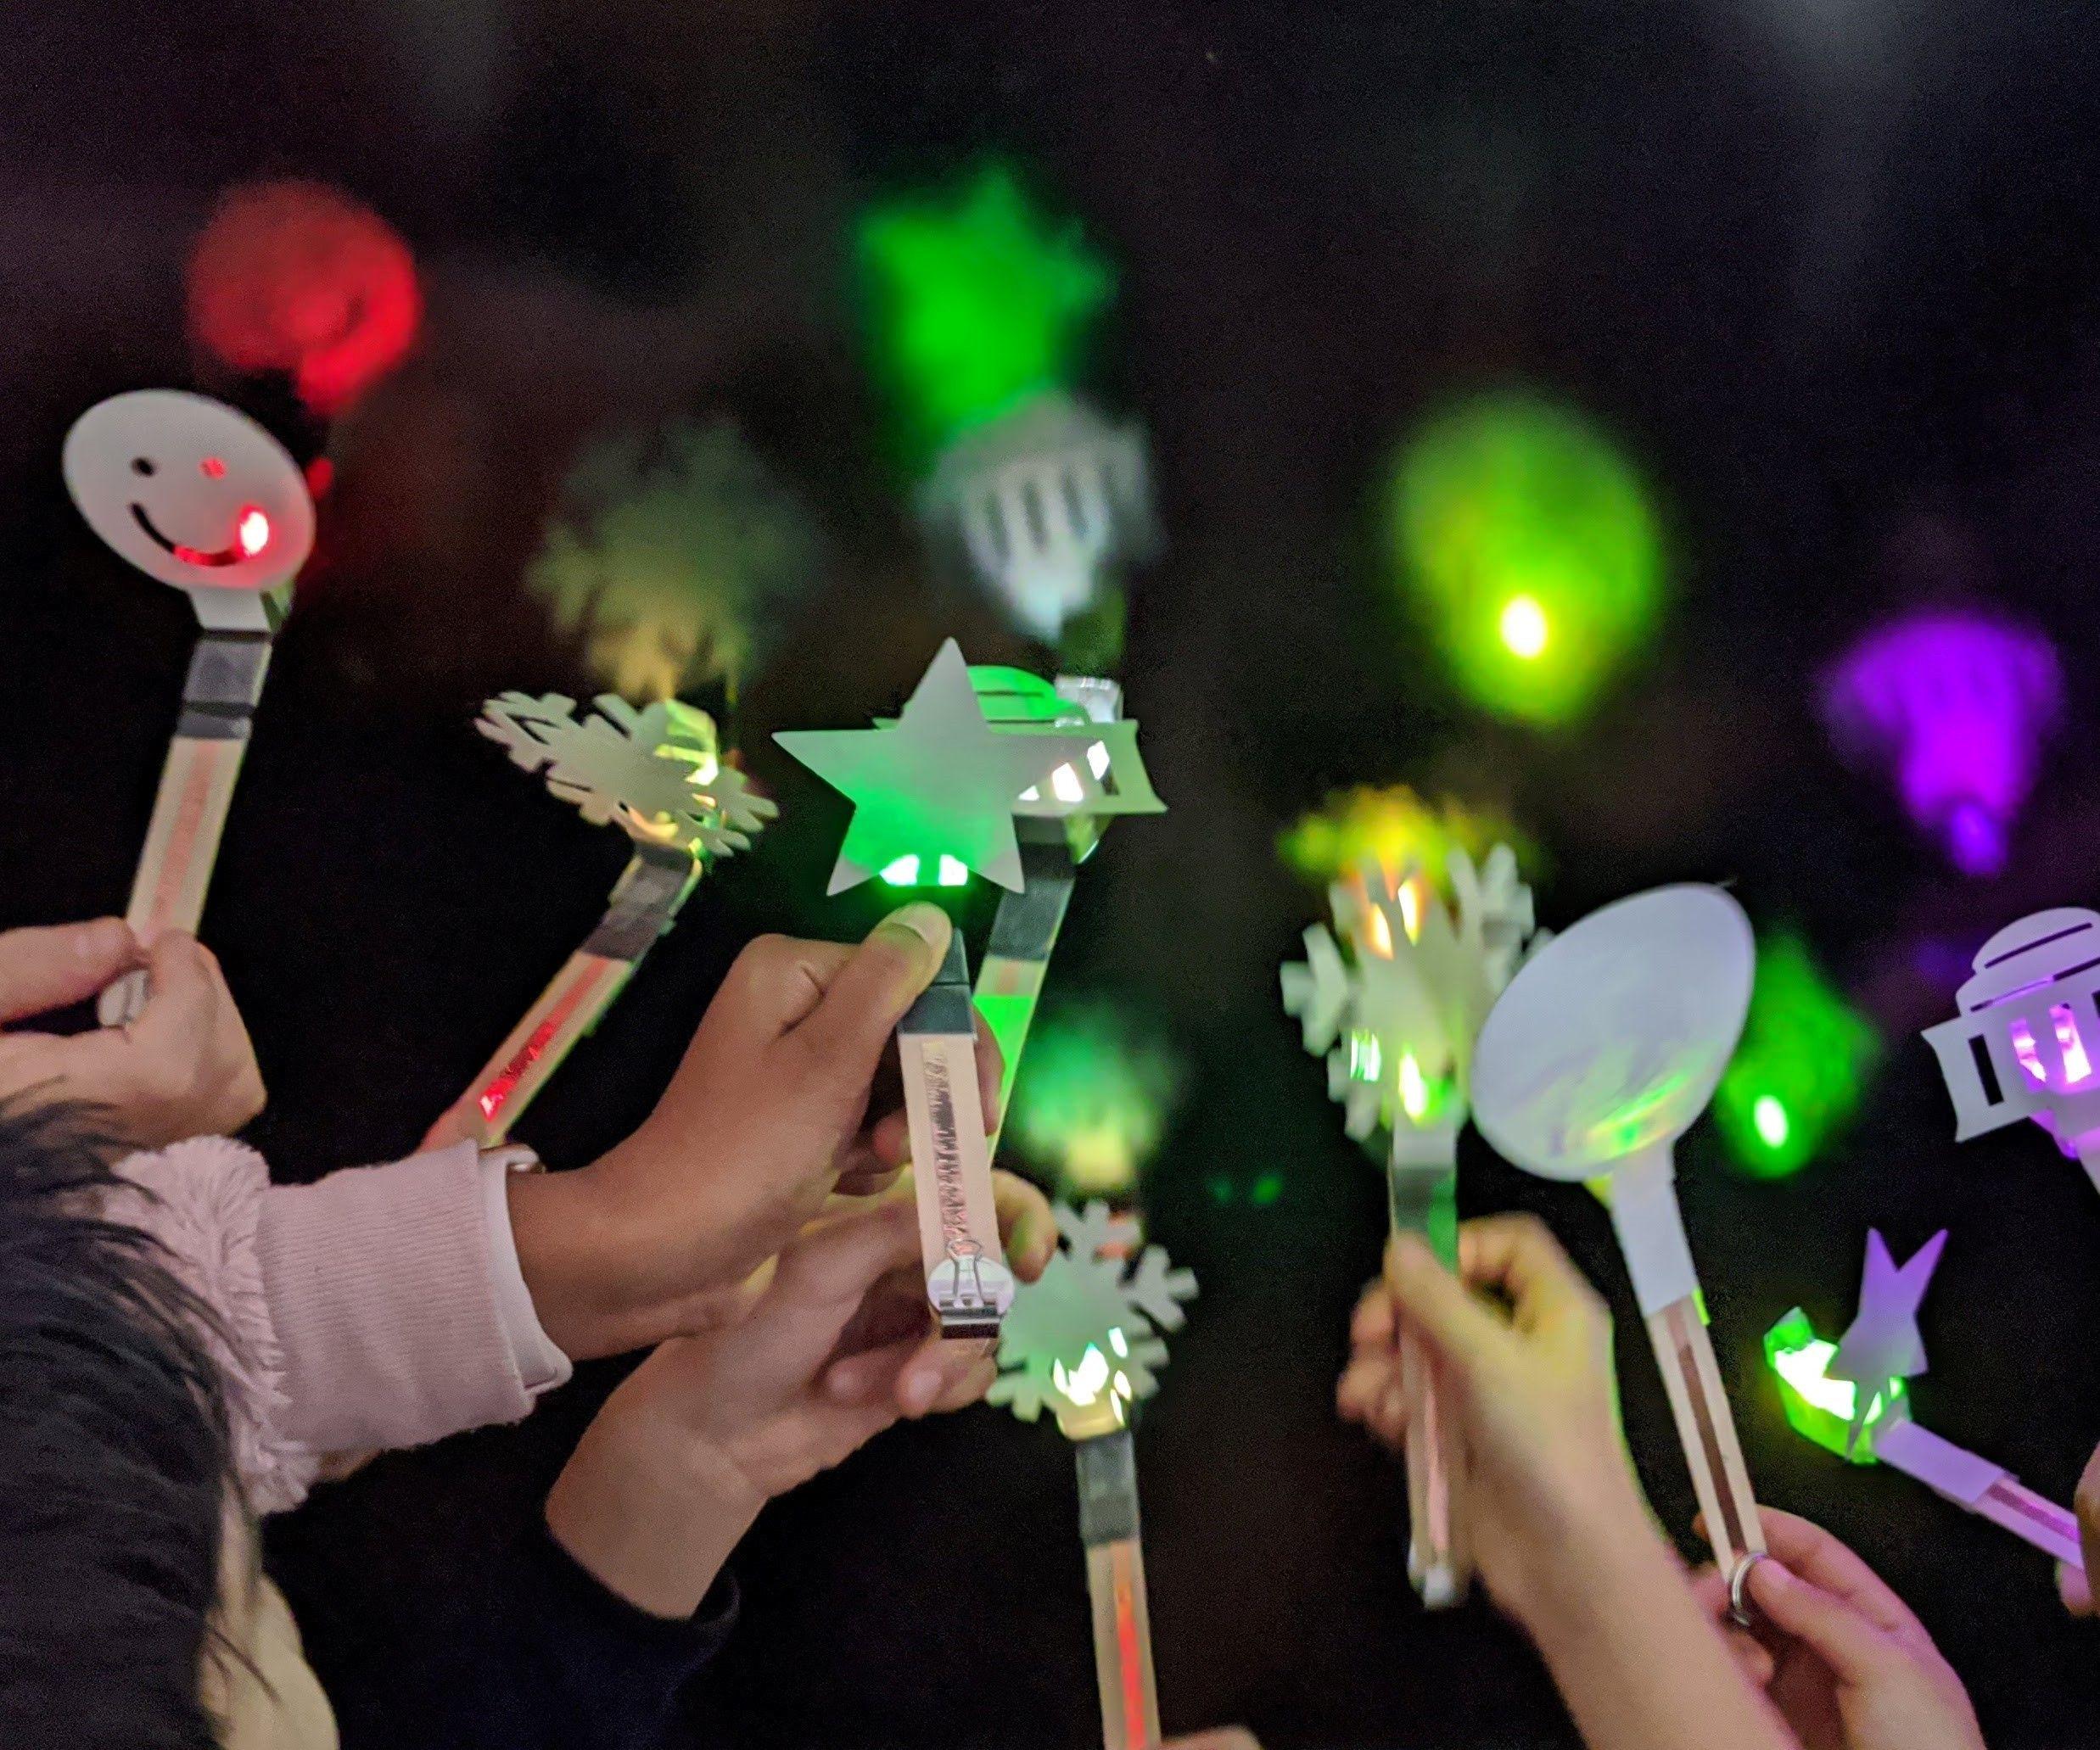 Festive Flashlights